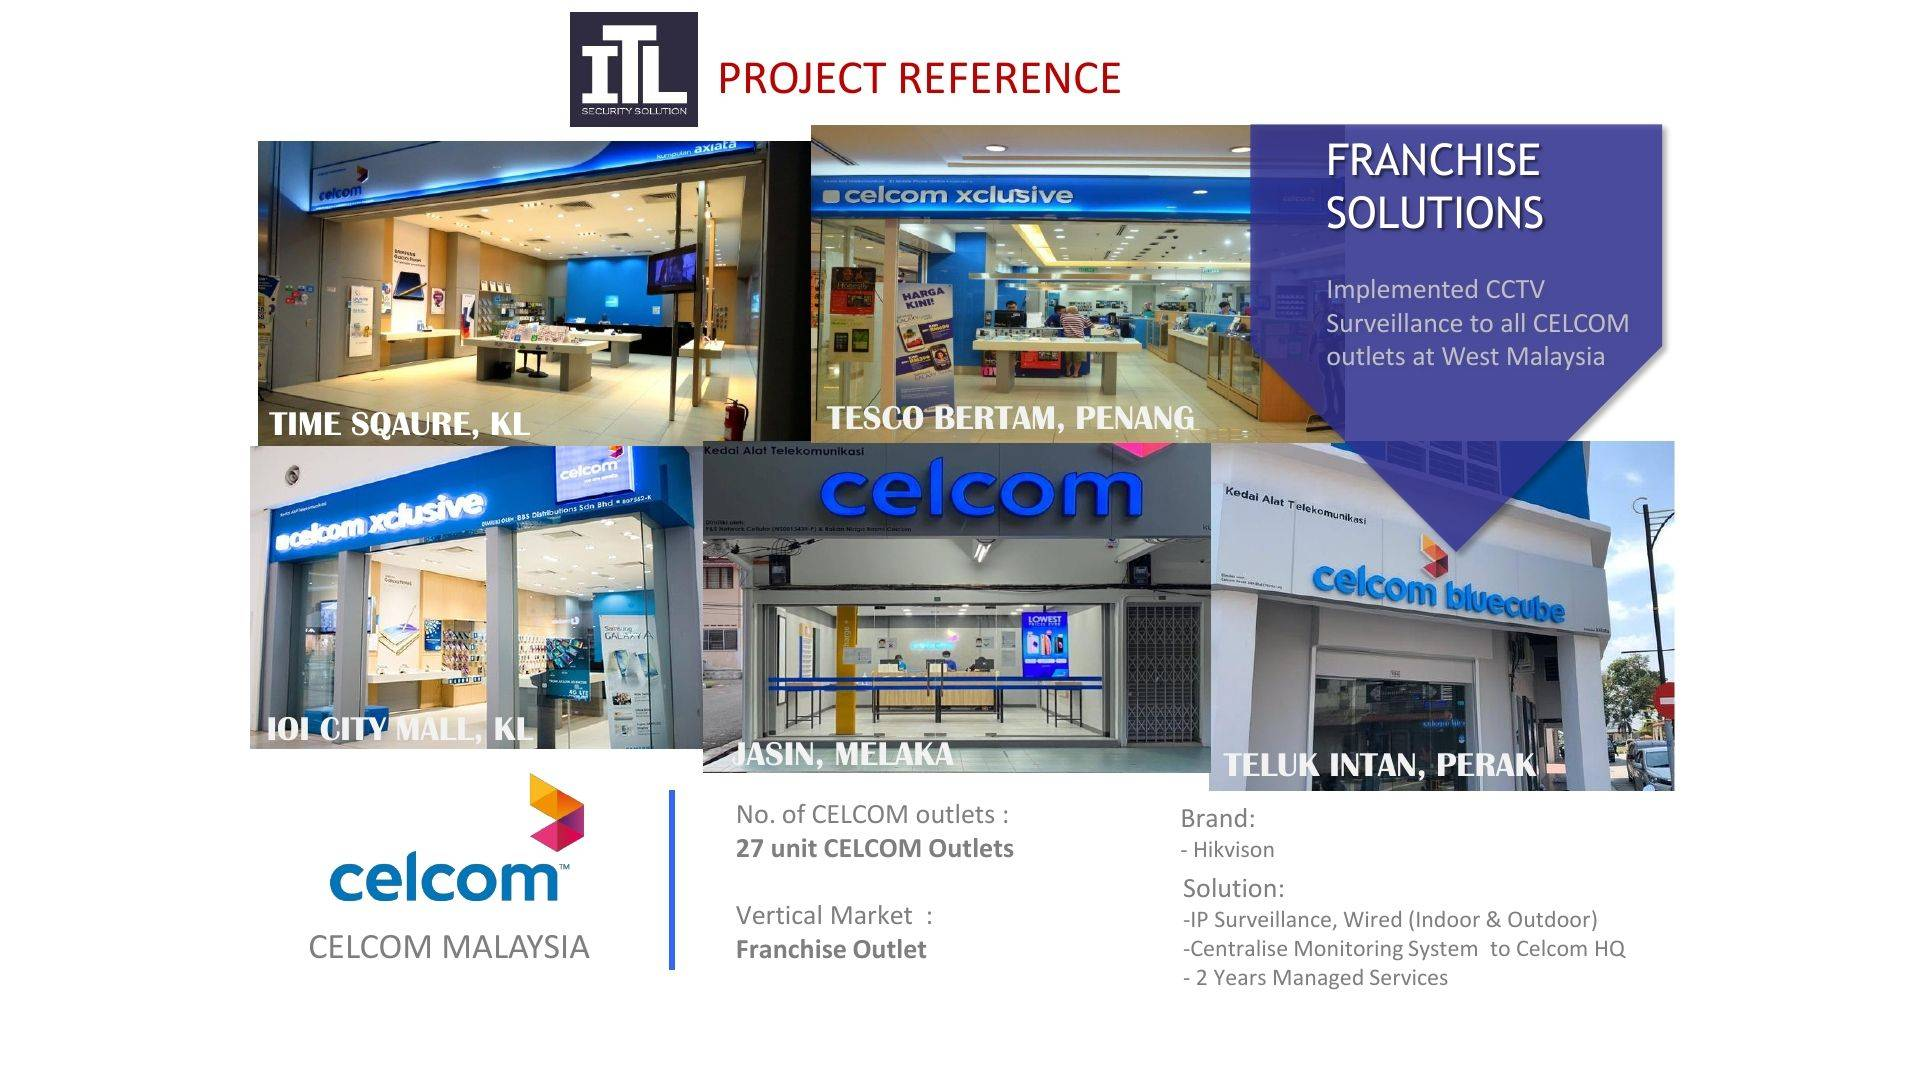 Celcom Malaysia